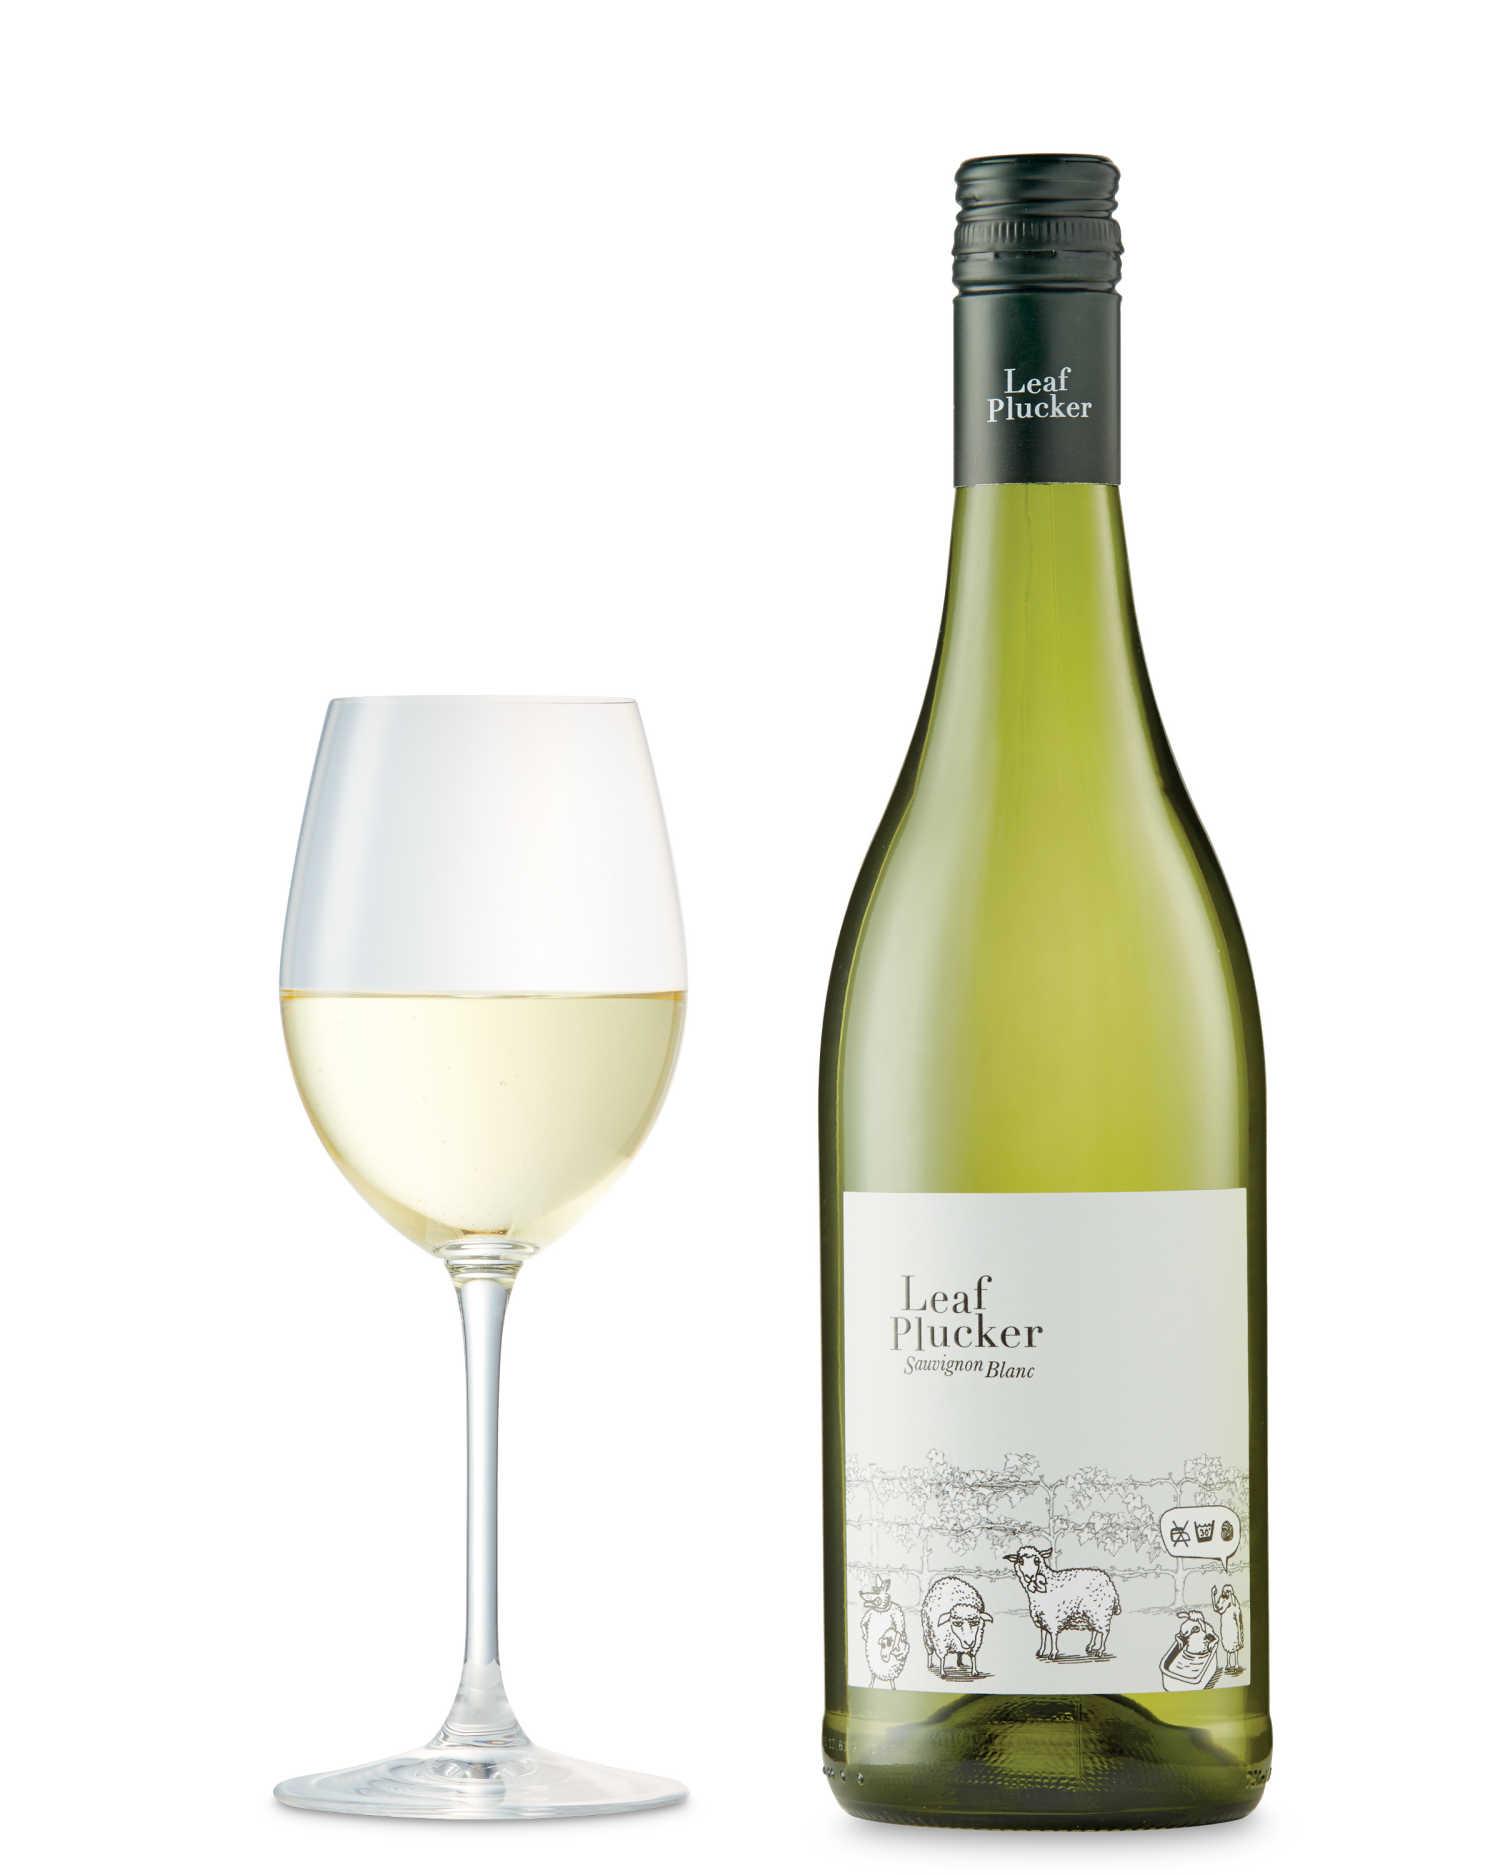 Leaf Plucker Sauvignon Blanc 2018